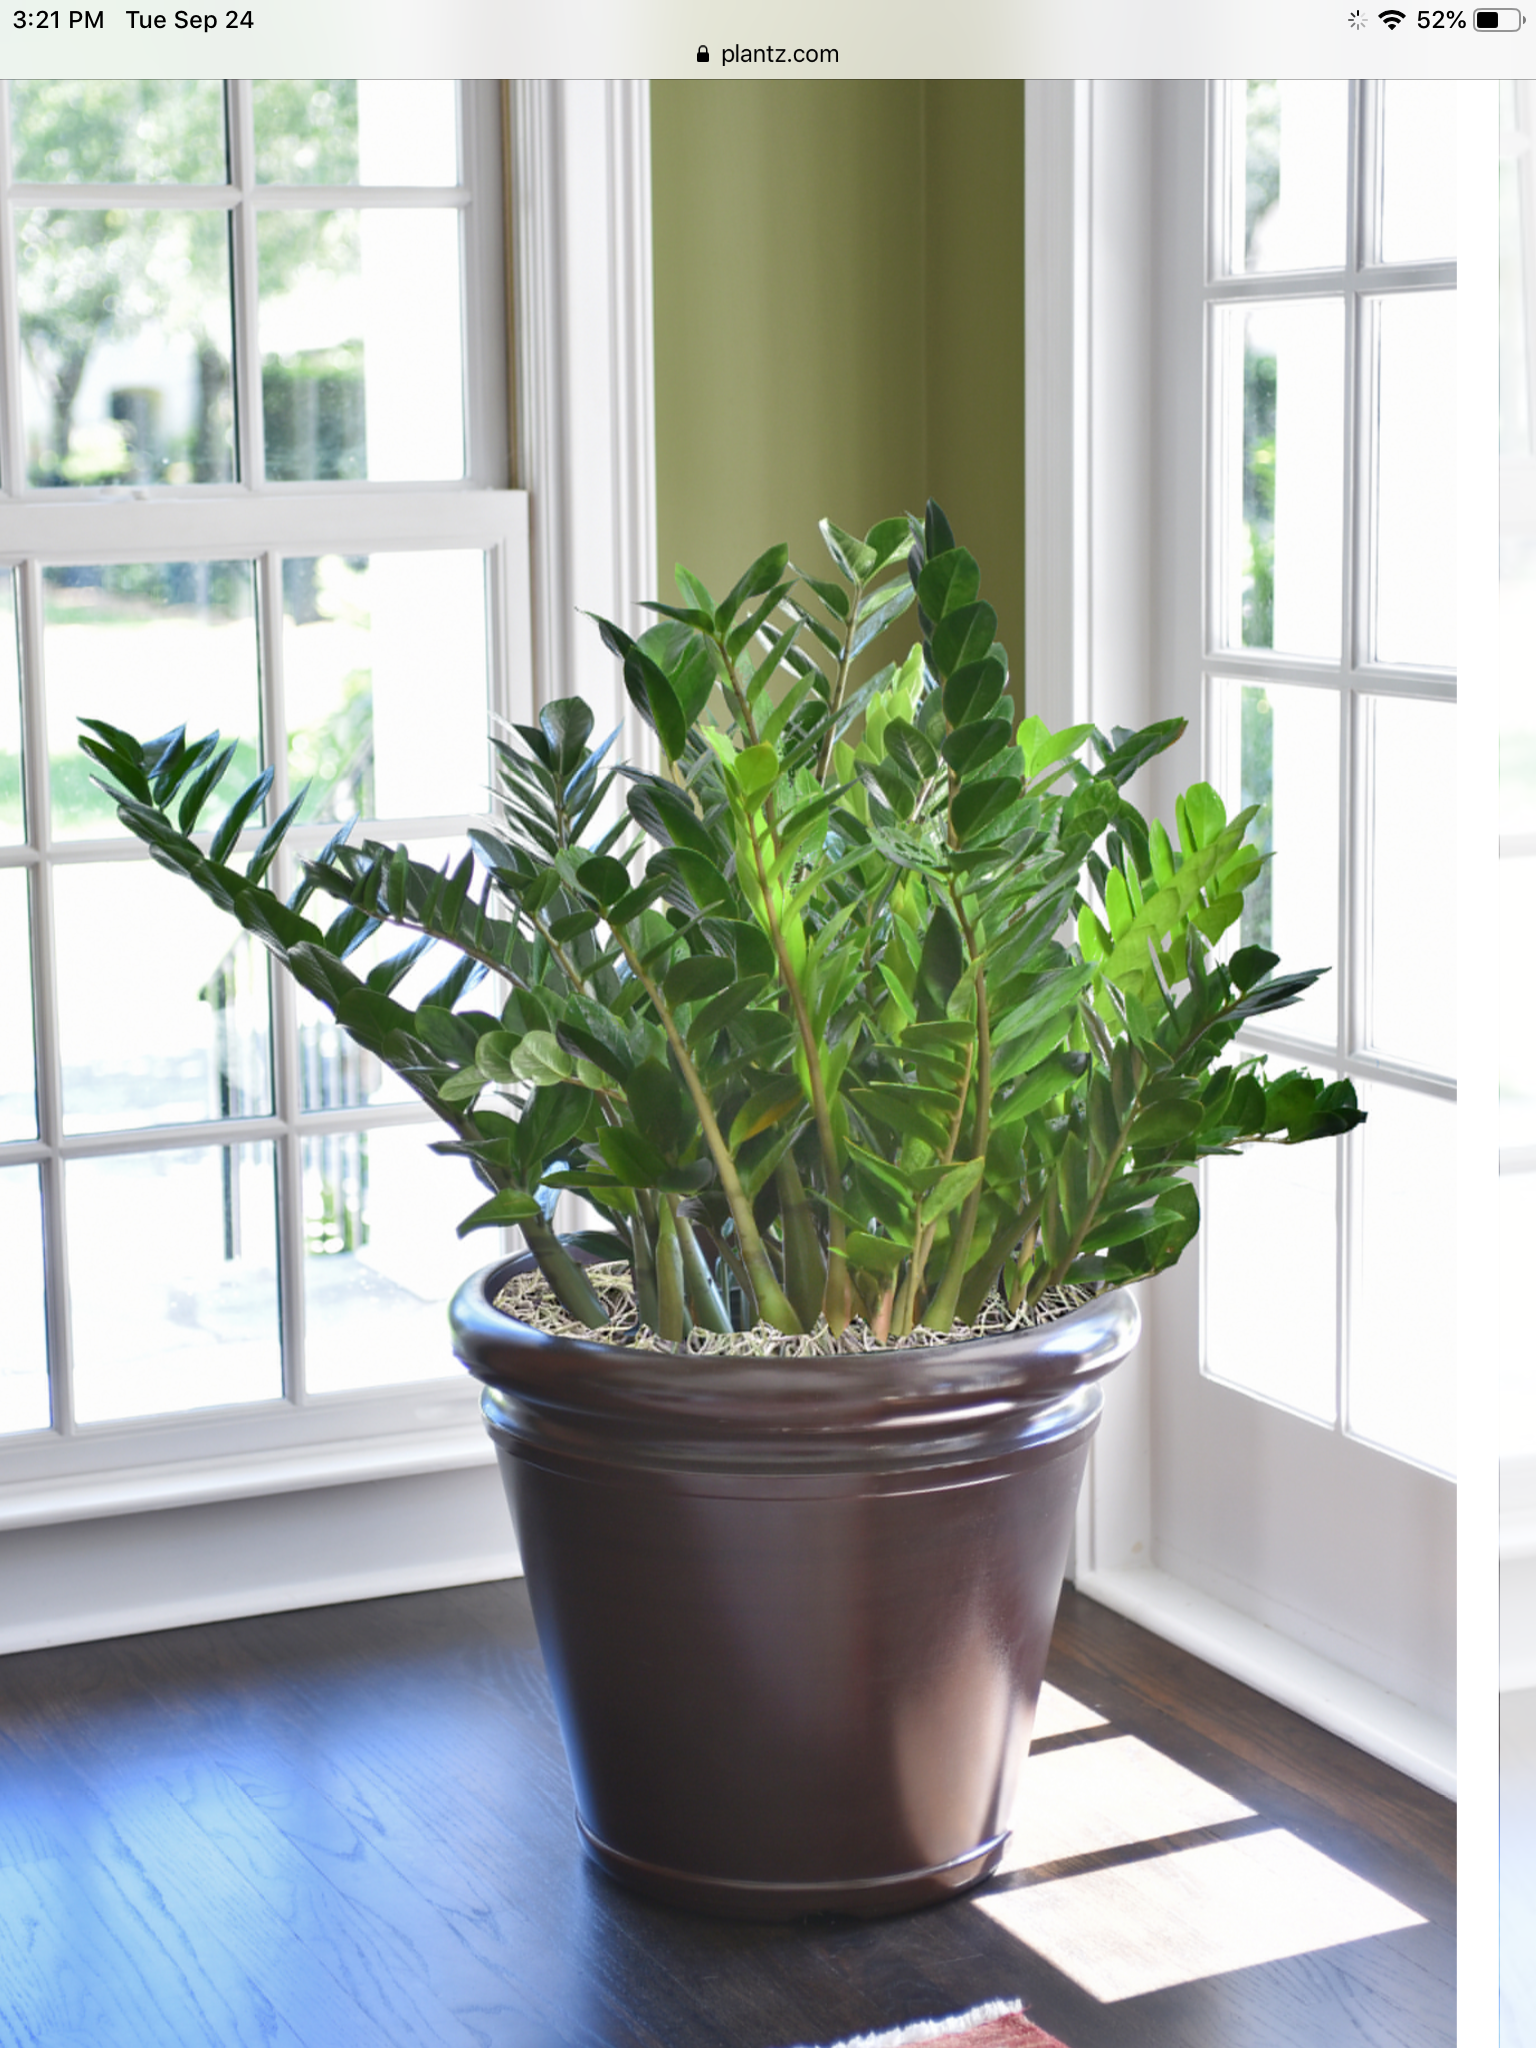 ZZ Plant for sale Order Online Full Size Plants Delivered